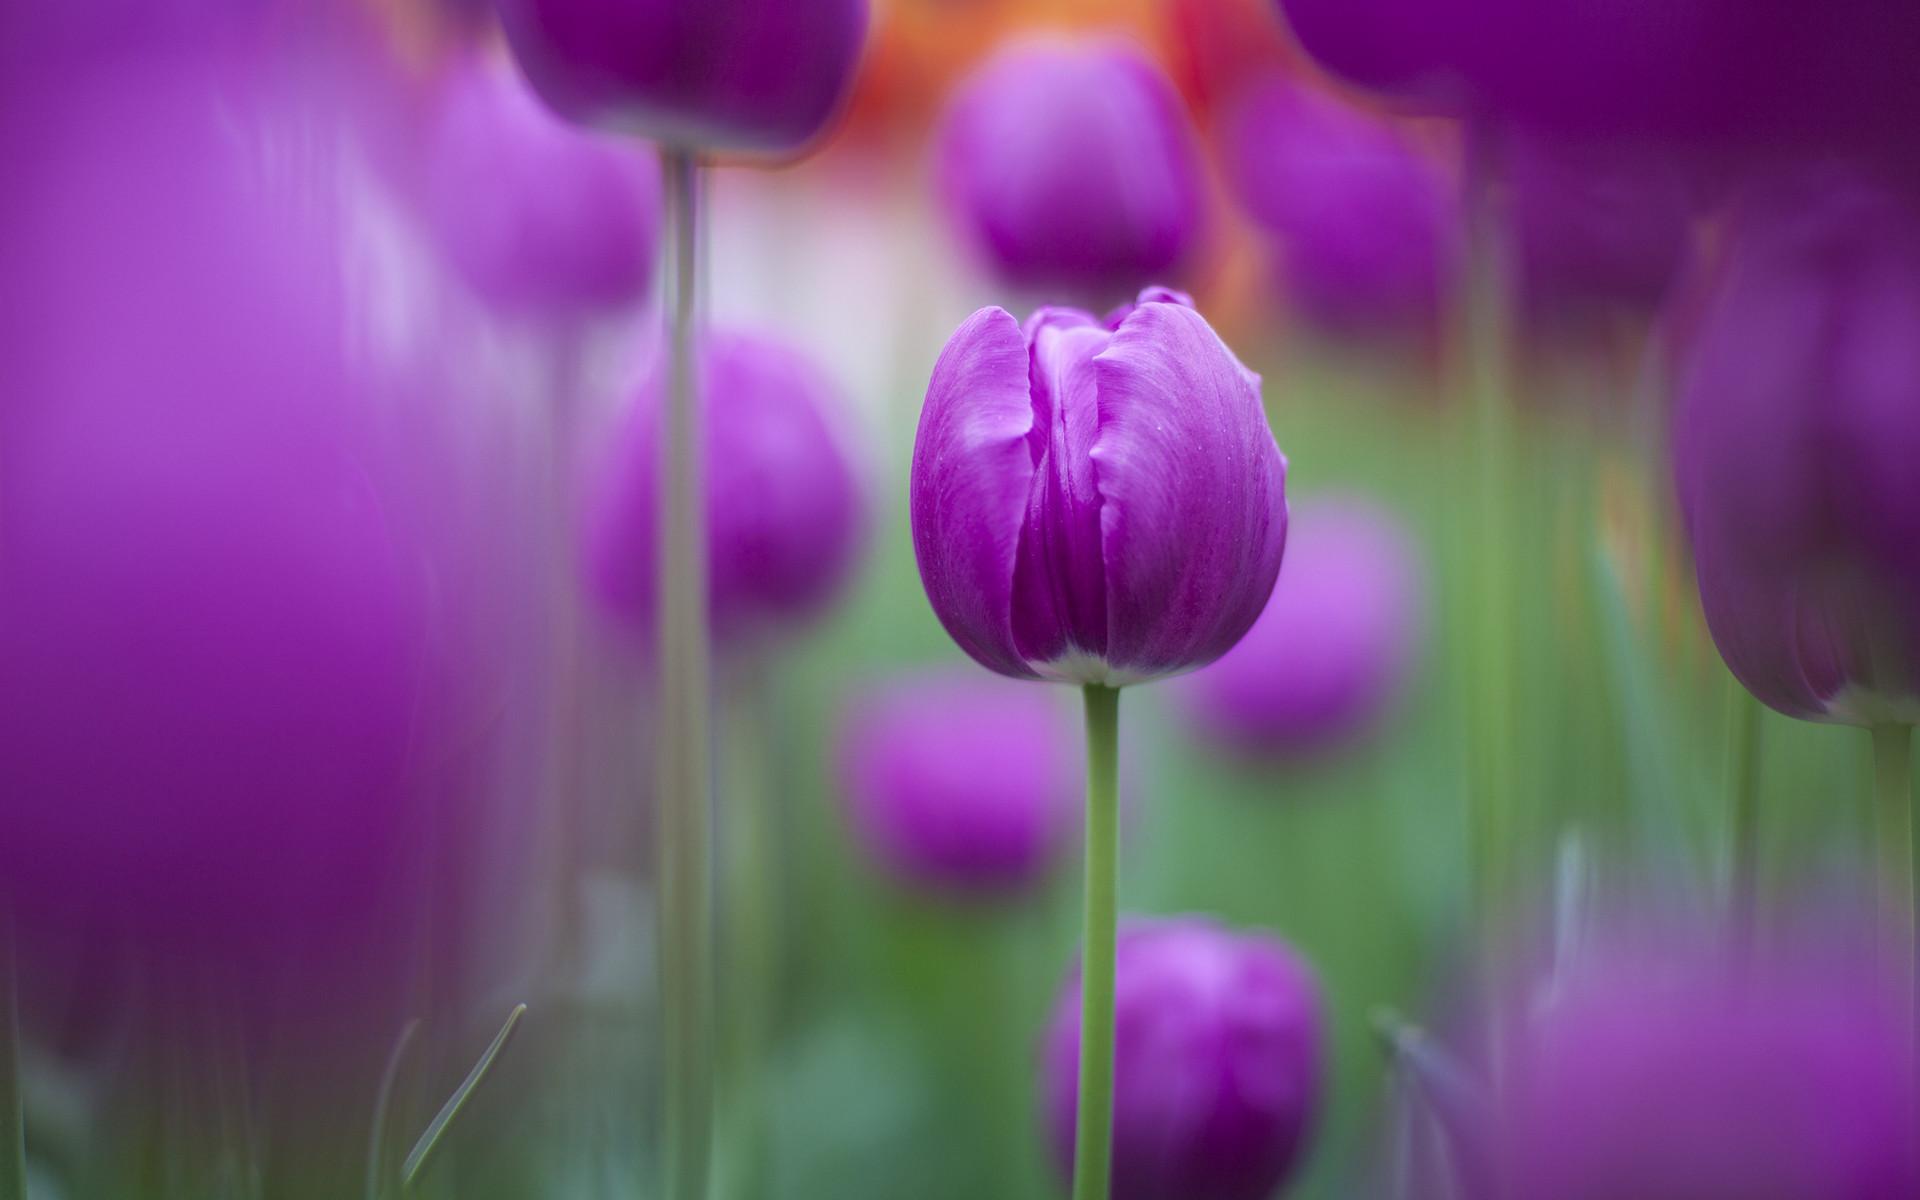 Purple Tulips Wallpapers | Free HD Wallpapers for Desktop, iPad .